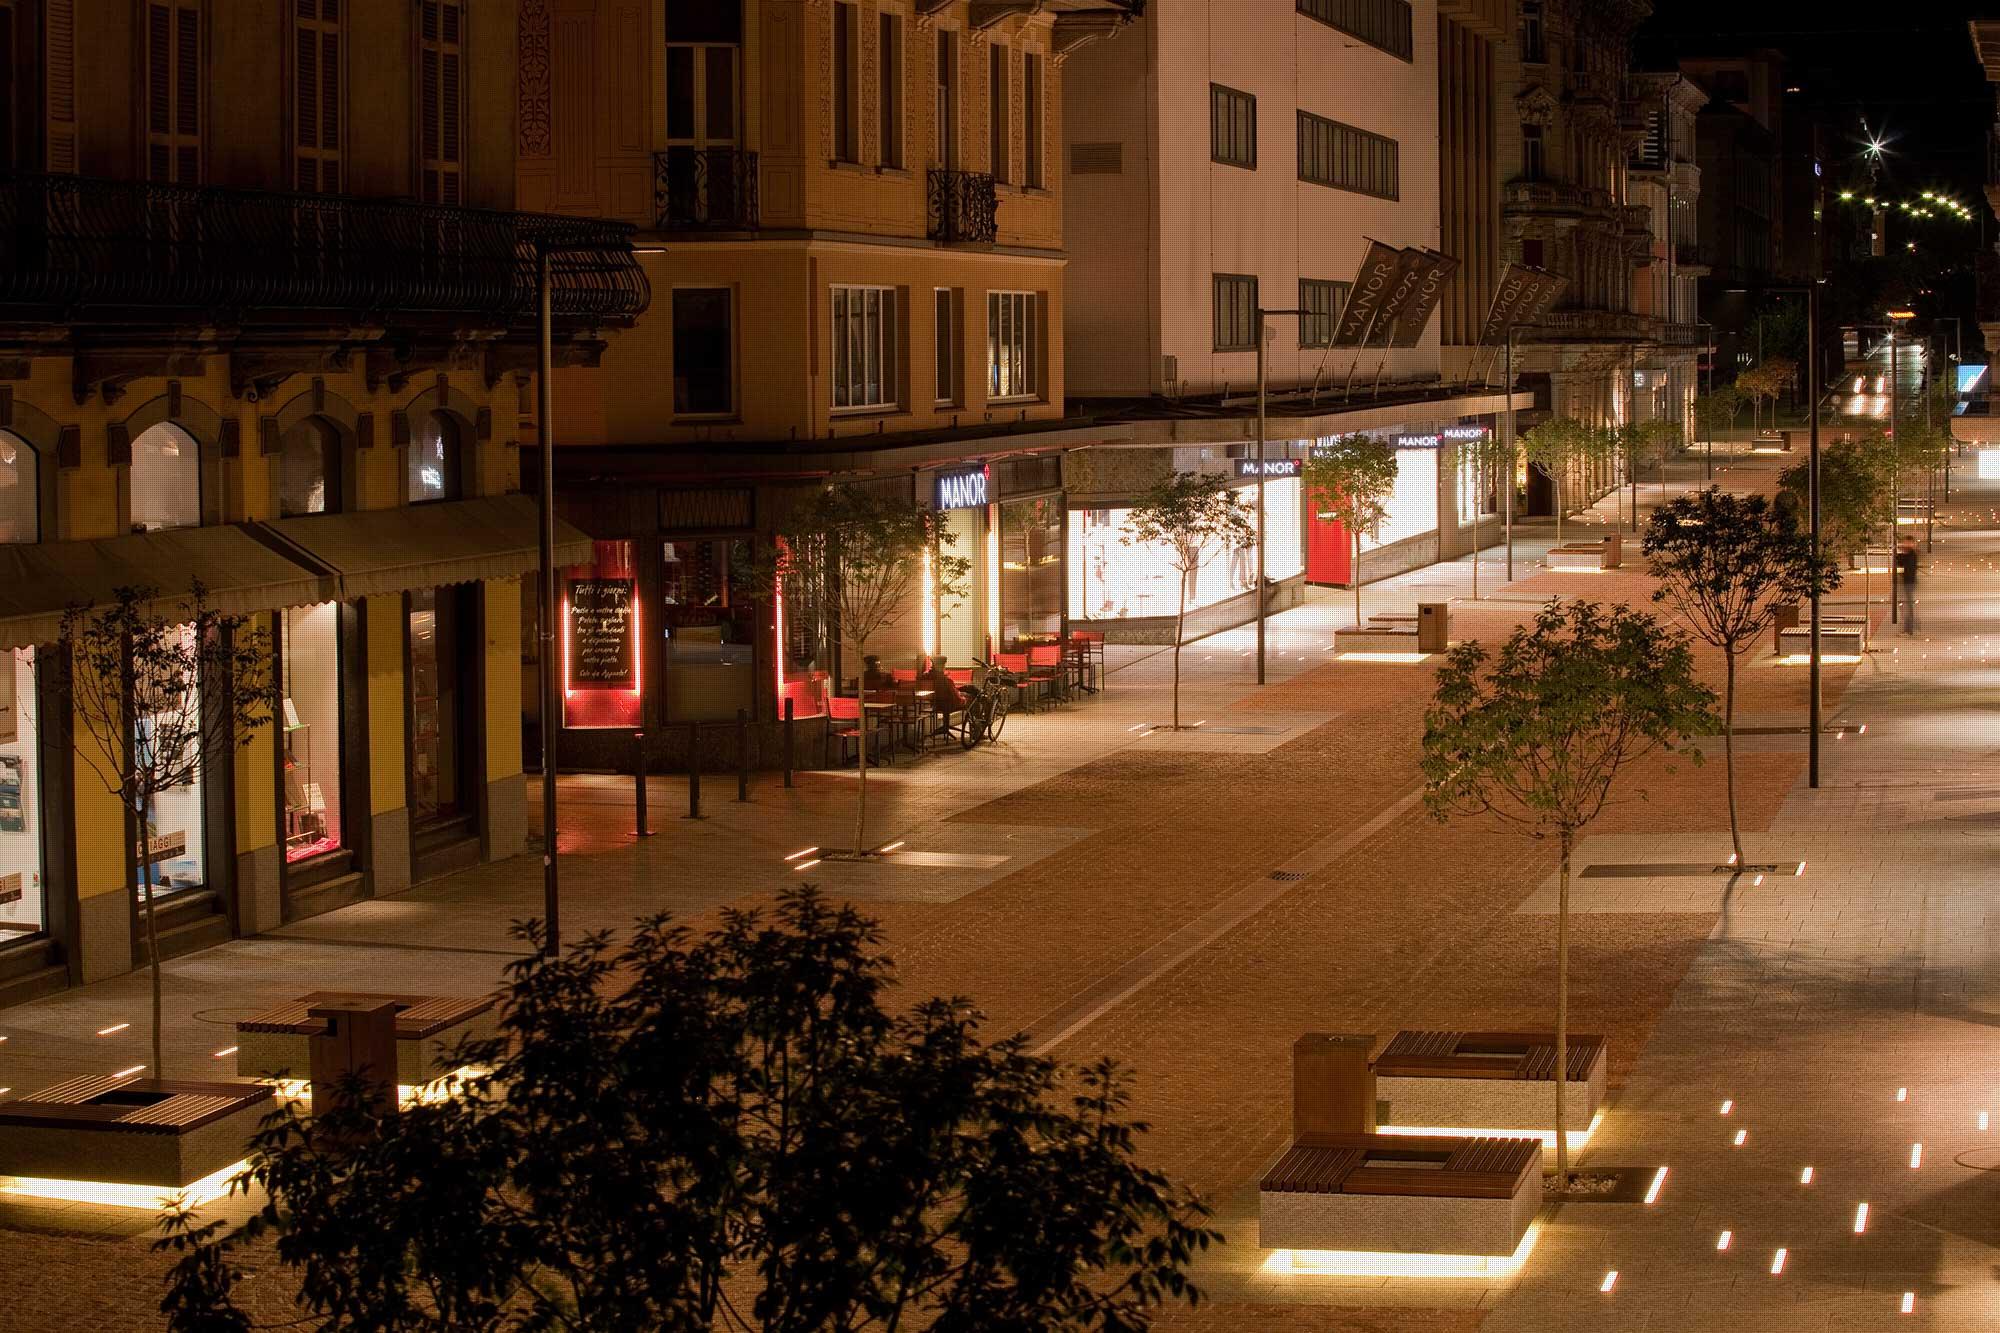 VIALE STAZIONE - Bellinzona  - Switzerland